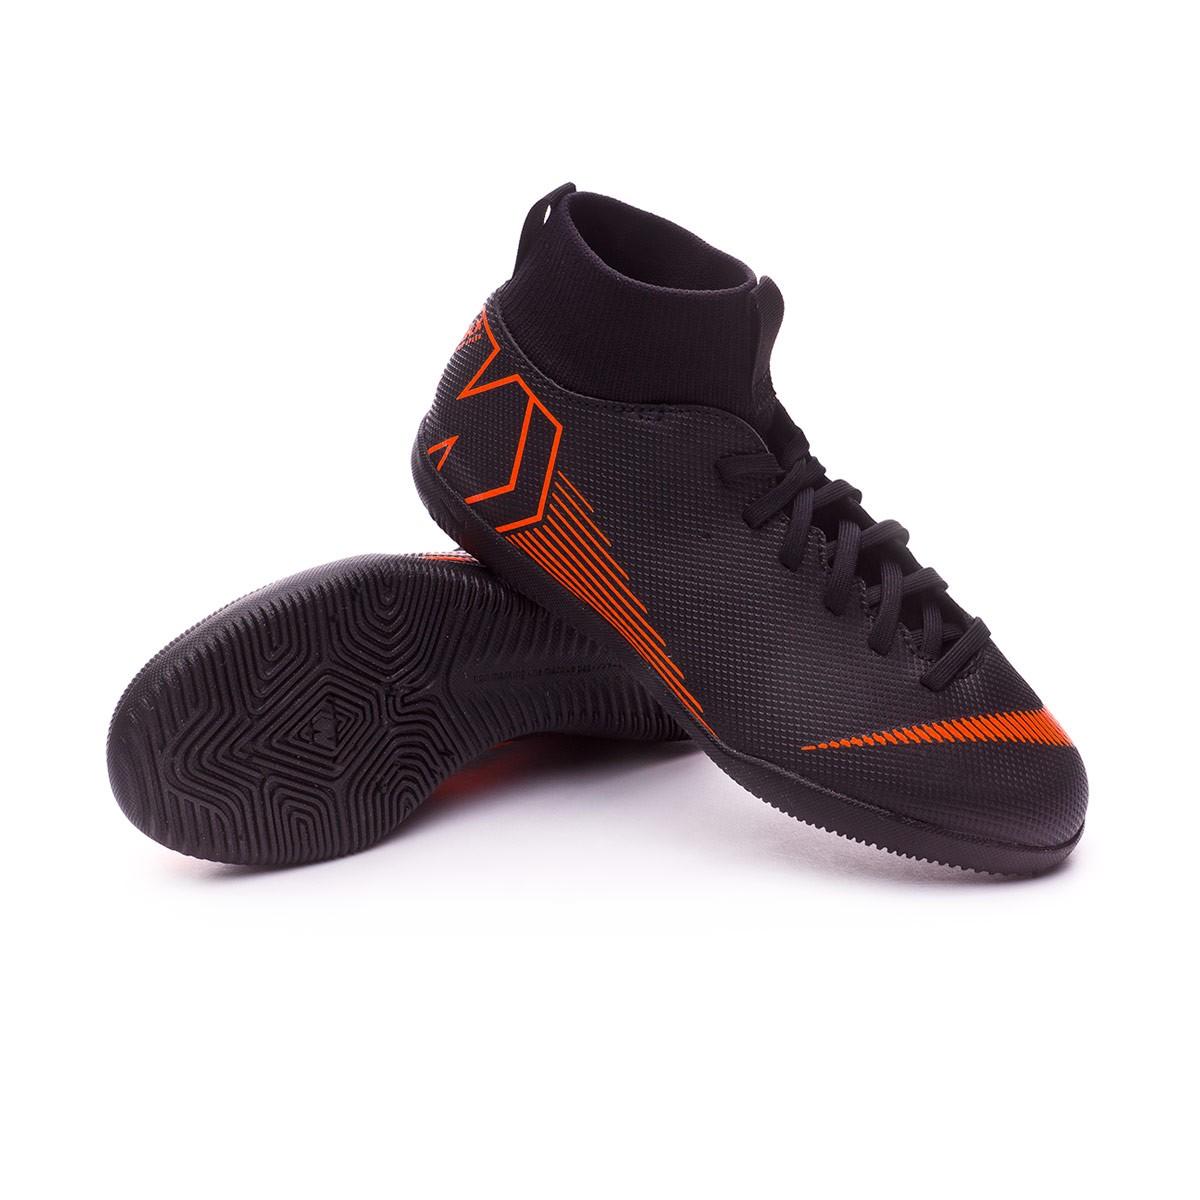 78ccce46d8b6c Zapatilla Nike Mercurial SuperflyX VI Club IC Niño Black-Total orange-White  - Tienda de fútbol Fútbol Emotion